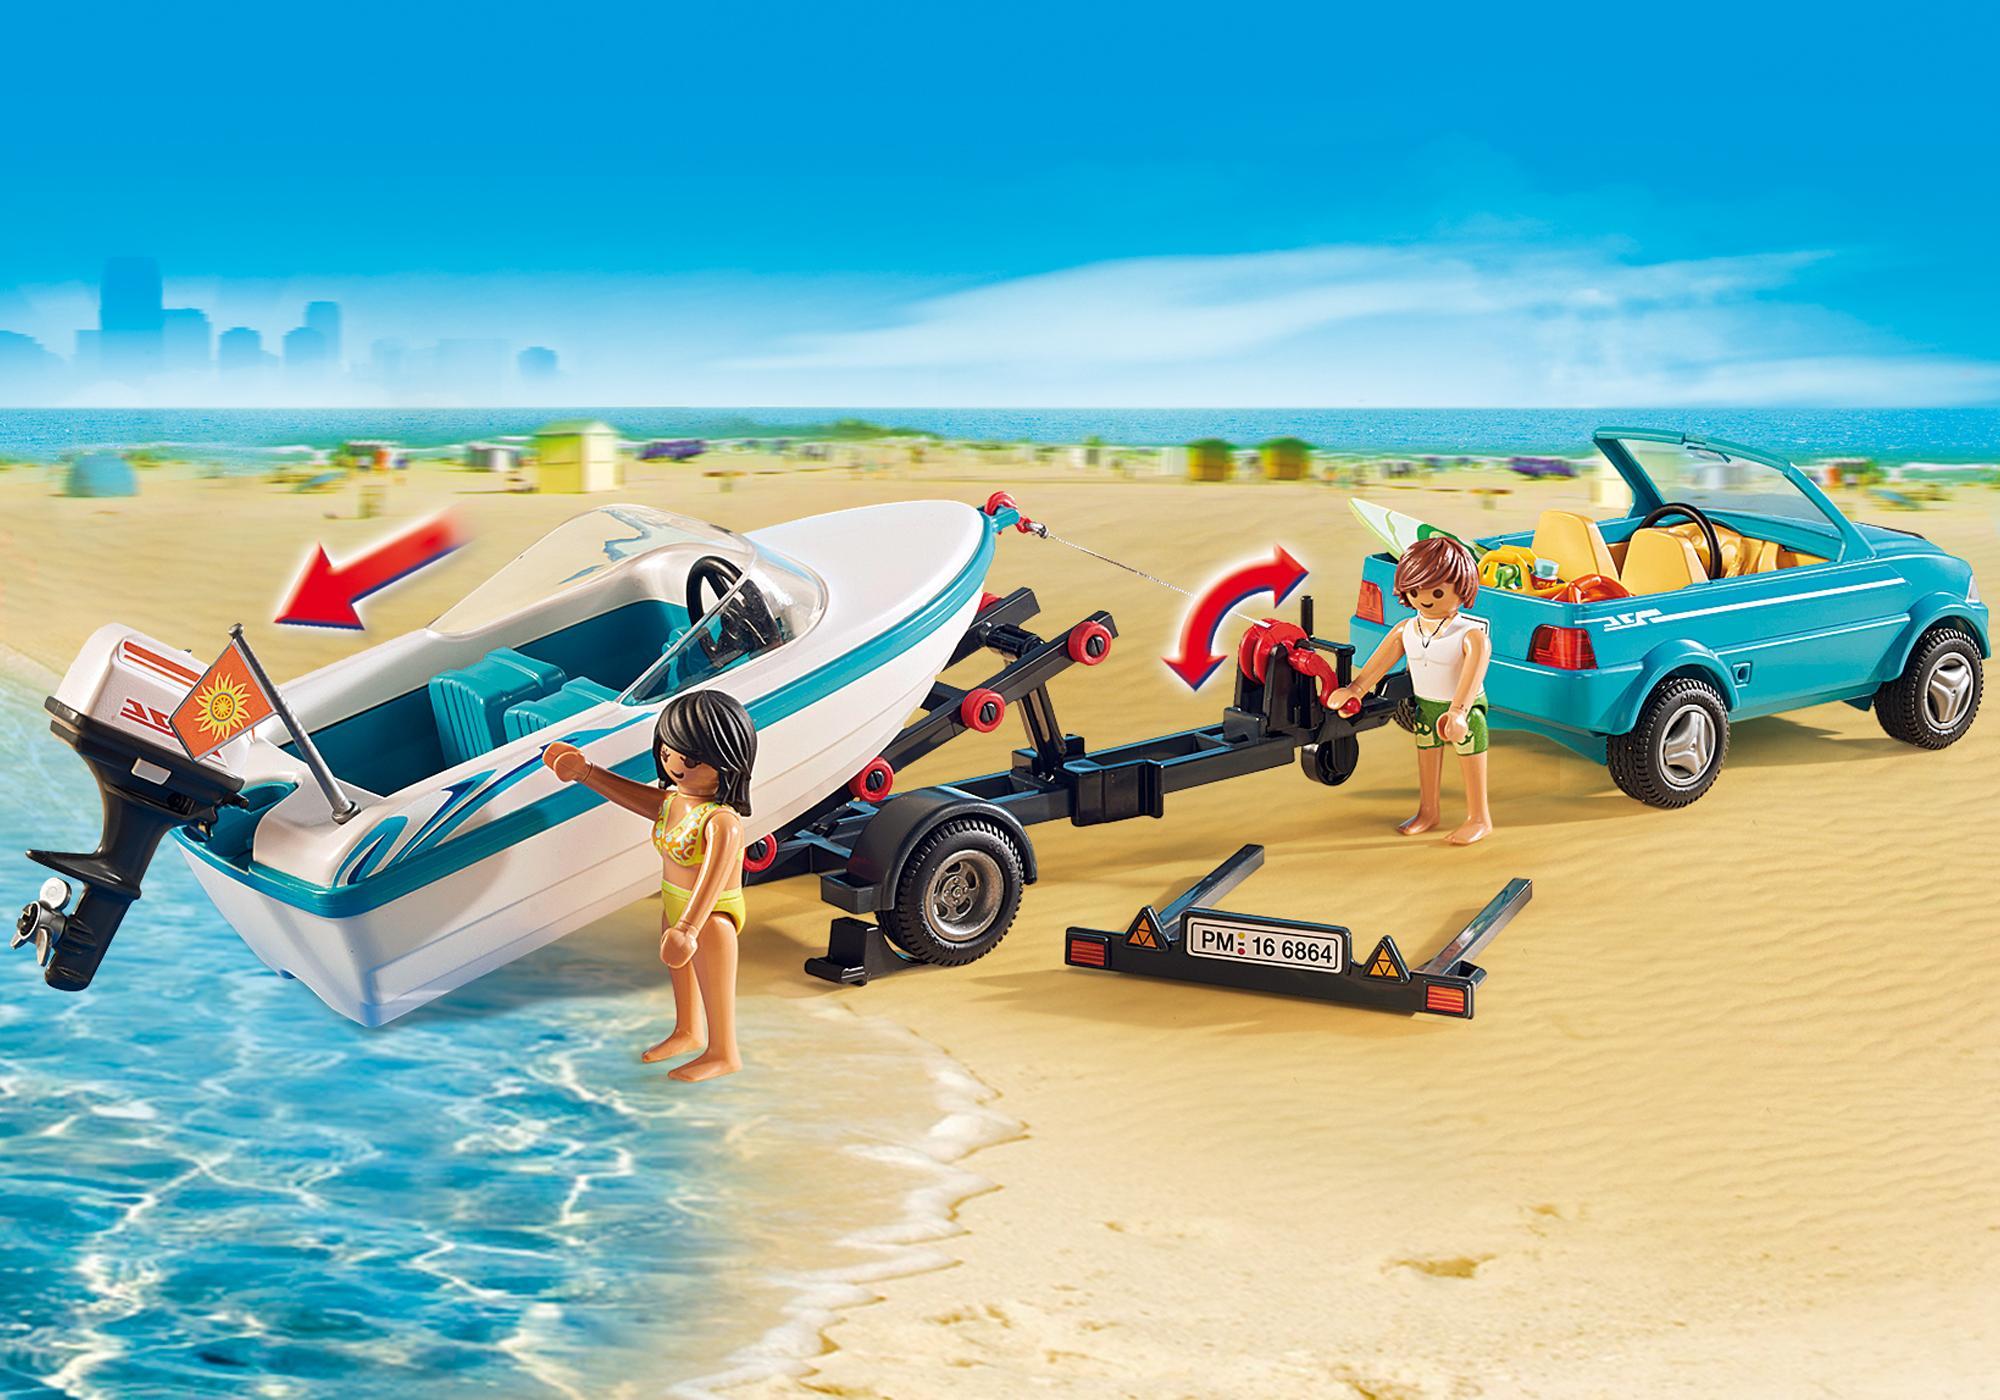 http://media.playmobil.com/i/playmobil/6864_product_extra2/Pick-up met speedboot met onderwatermotor